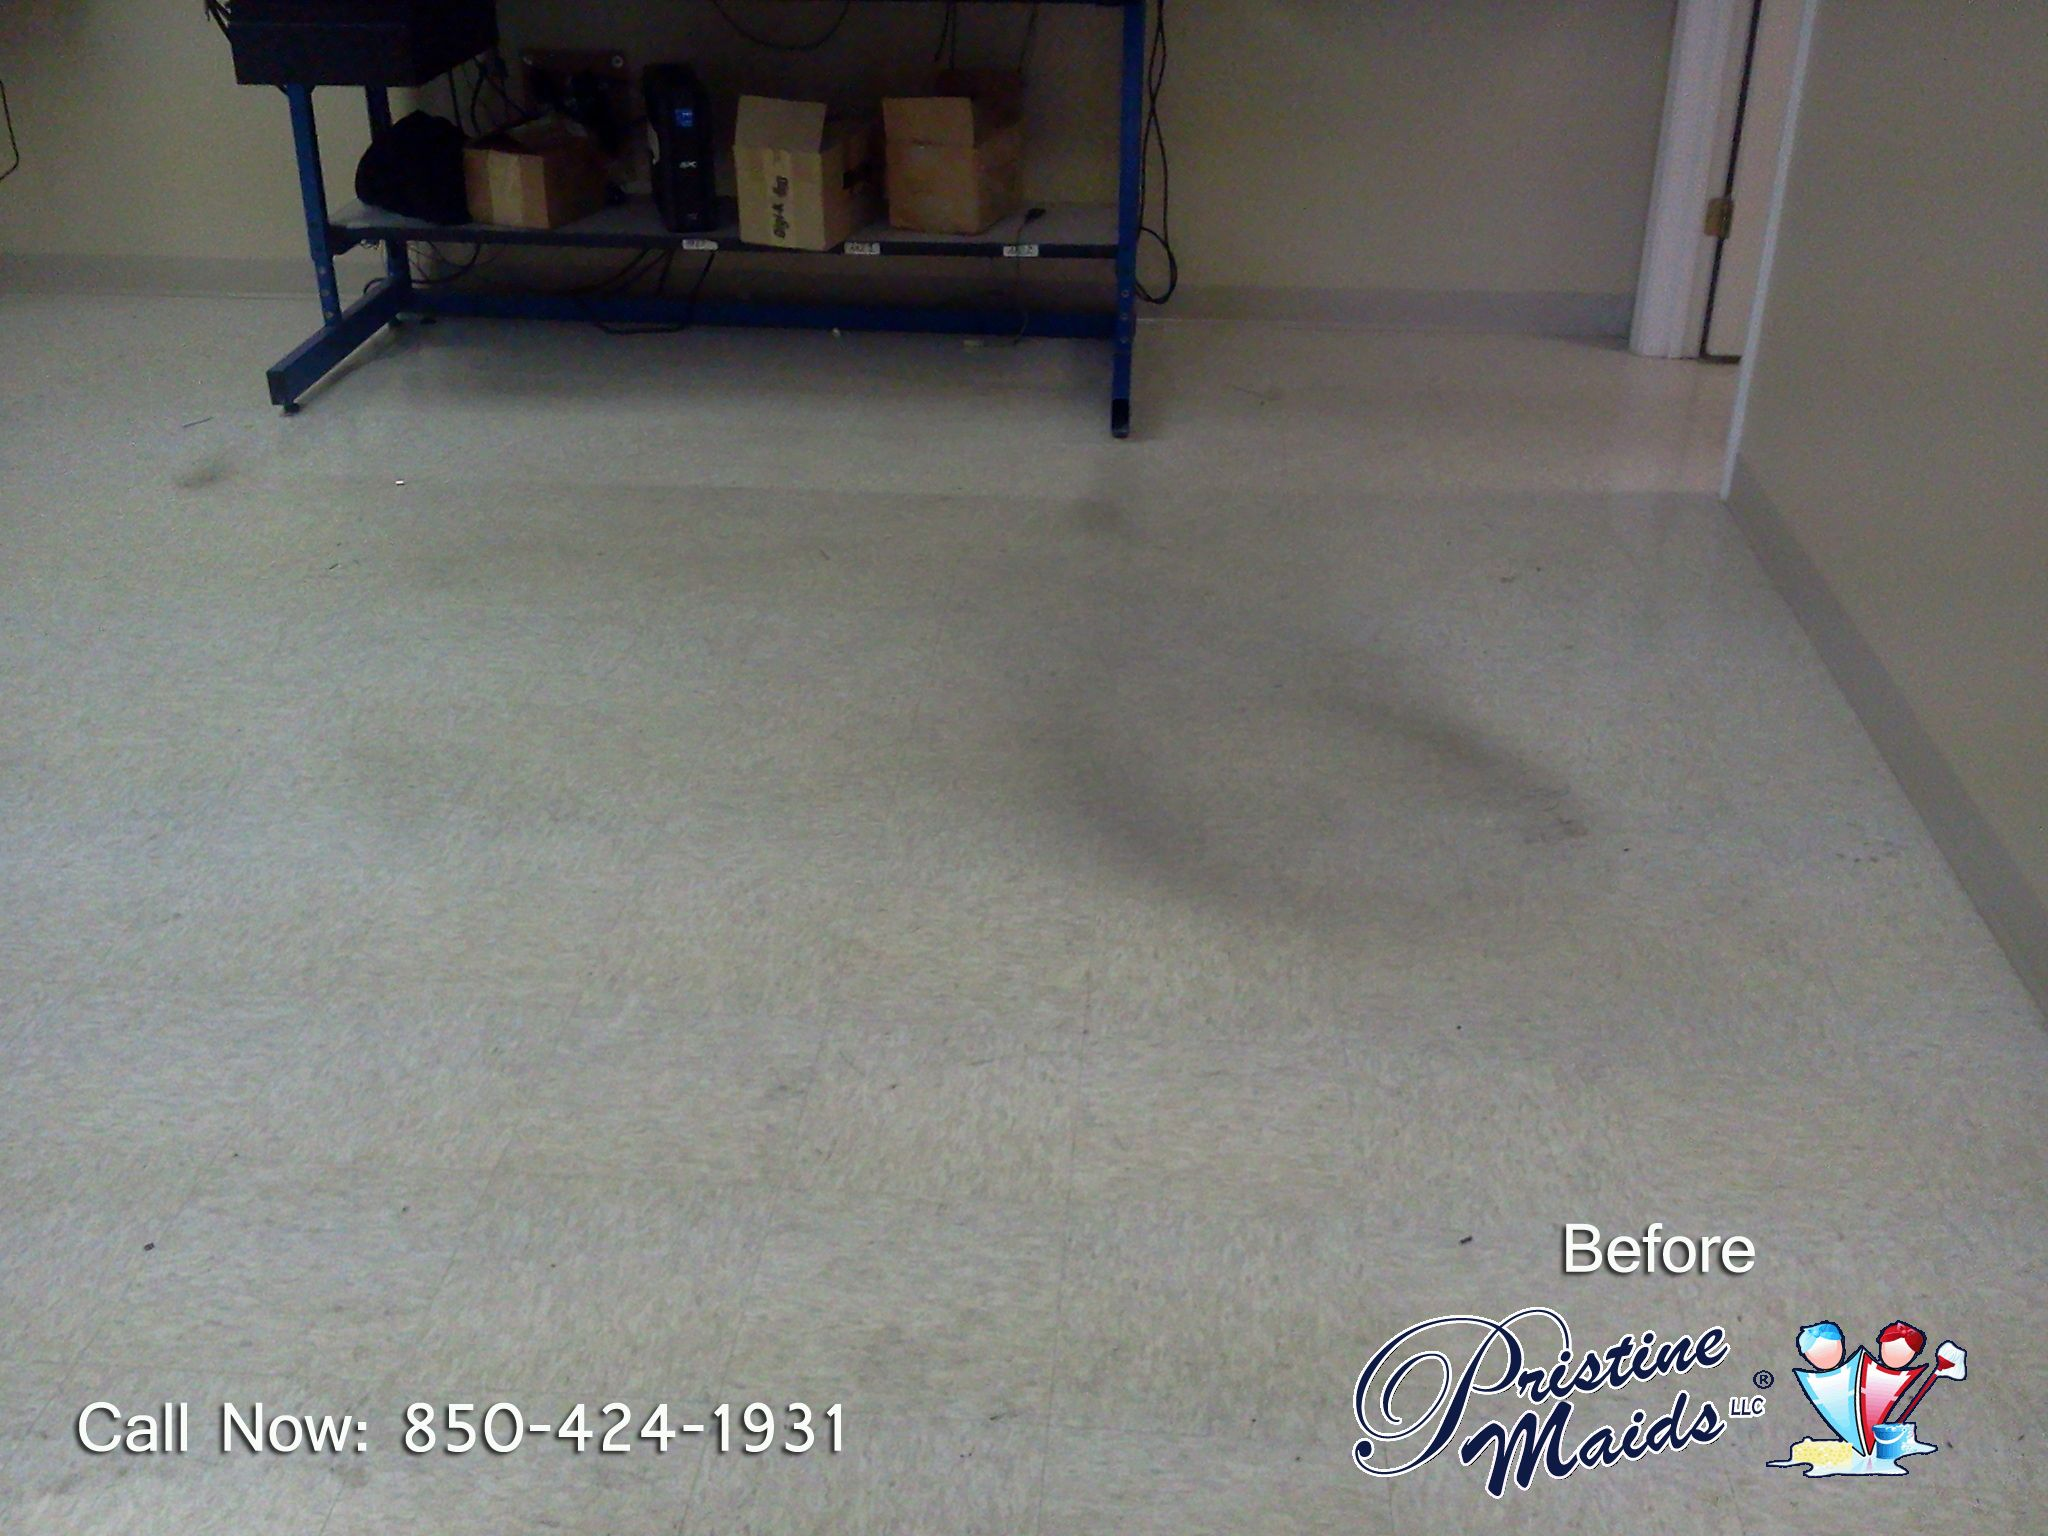 William Communications Strip Amp Wax Floor Before Floor